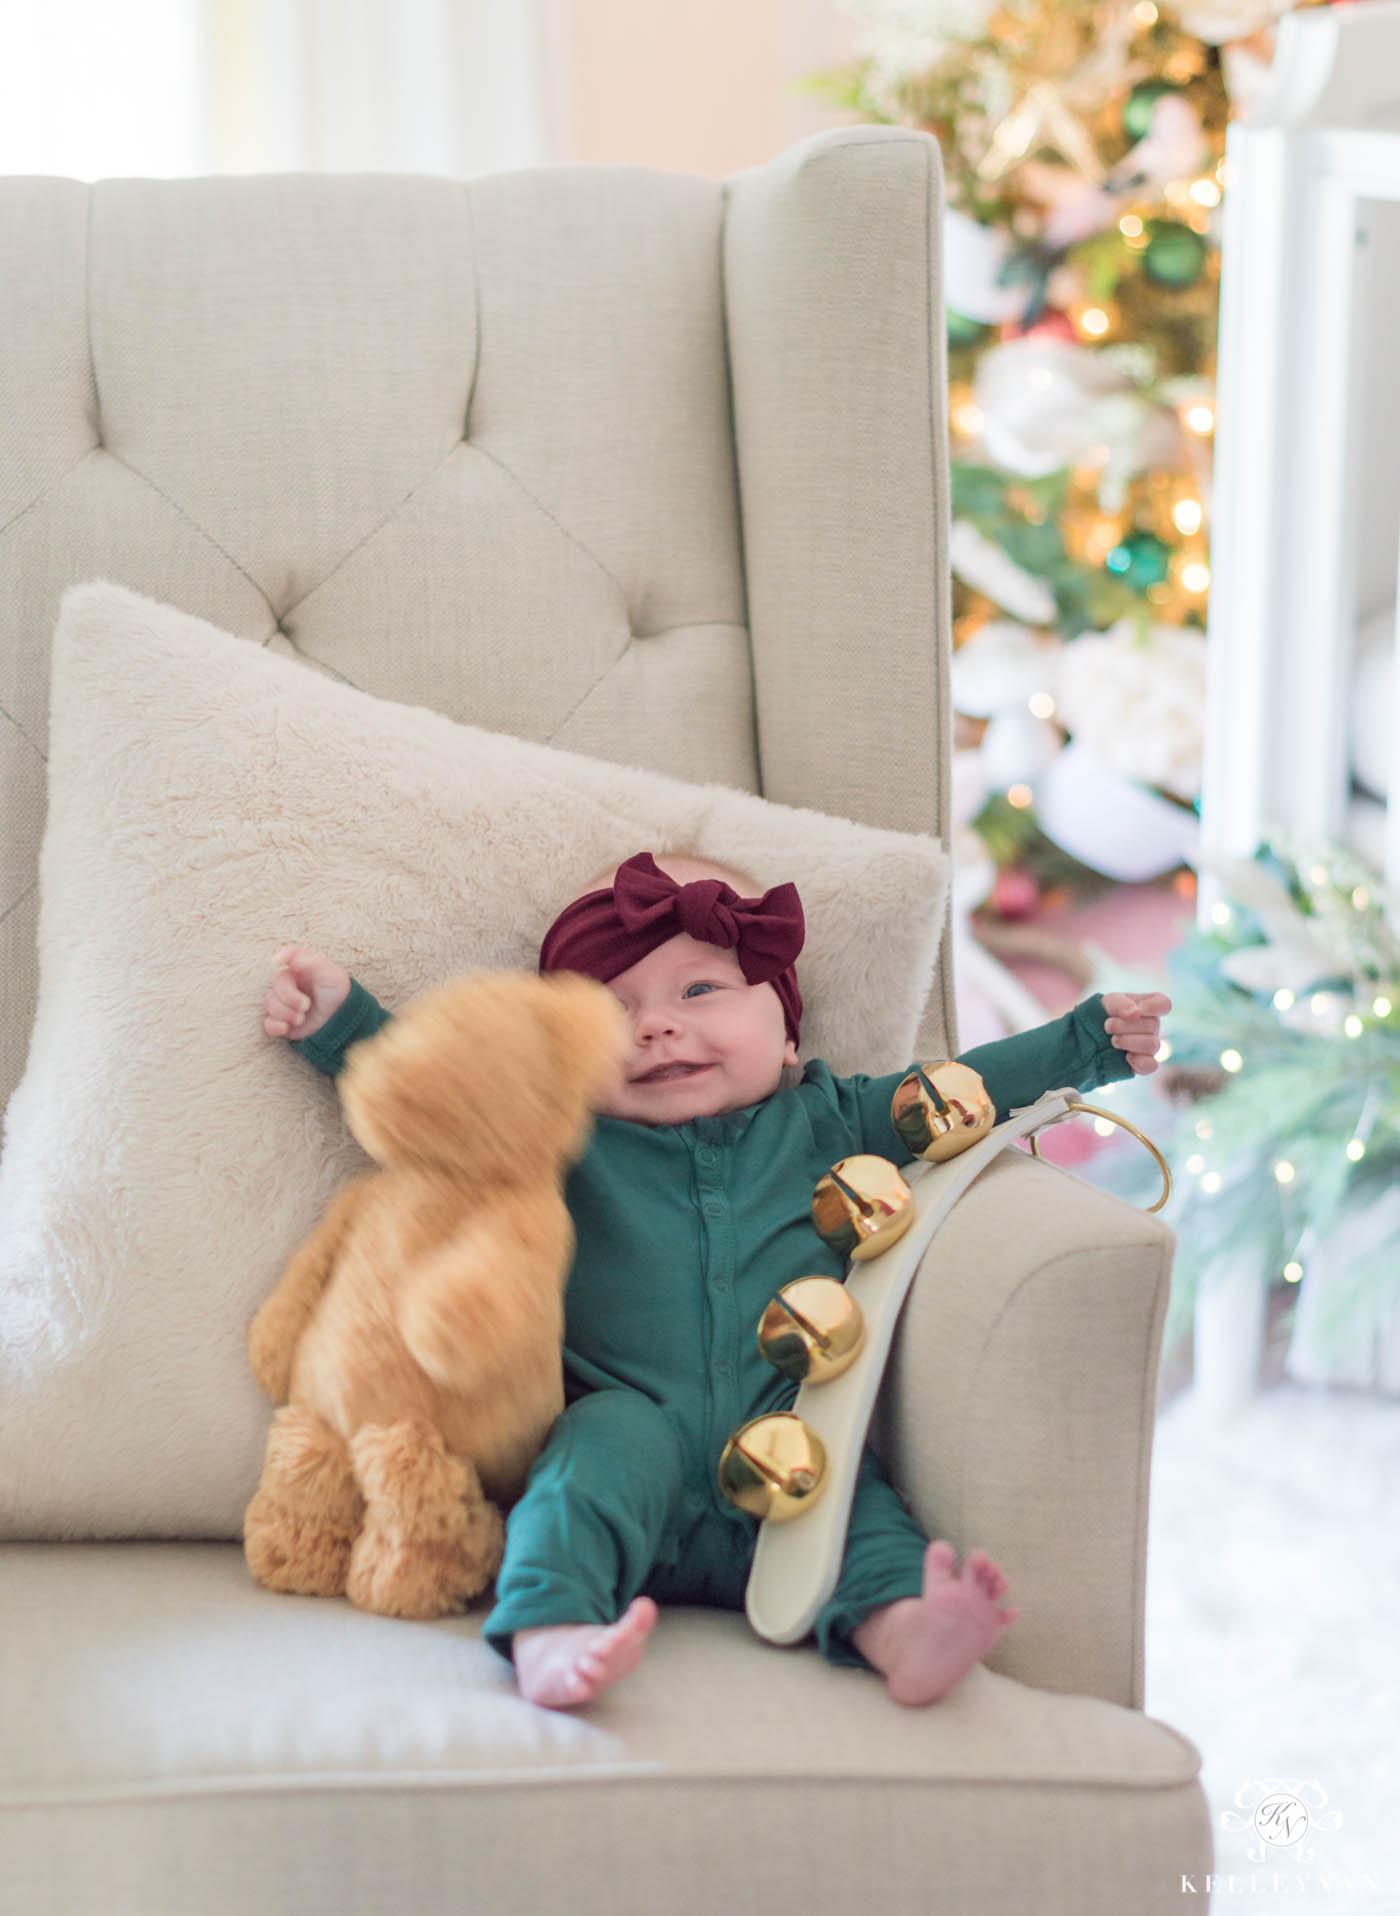 Christmas Nursery Decor